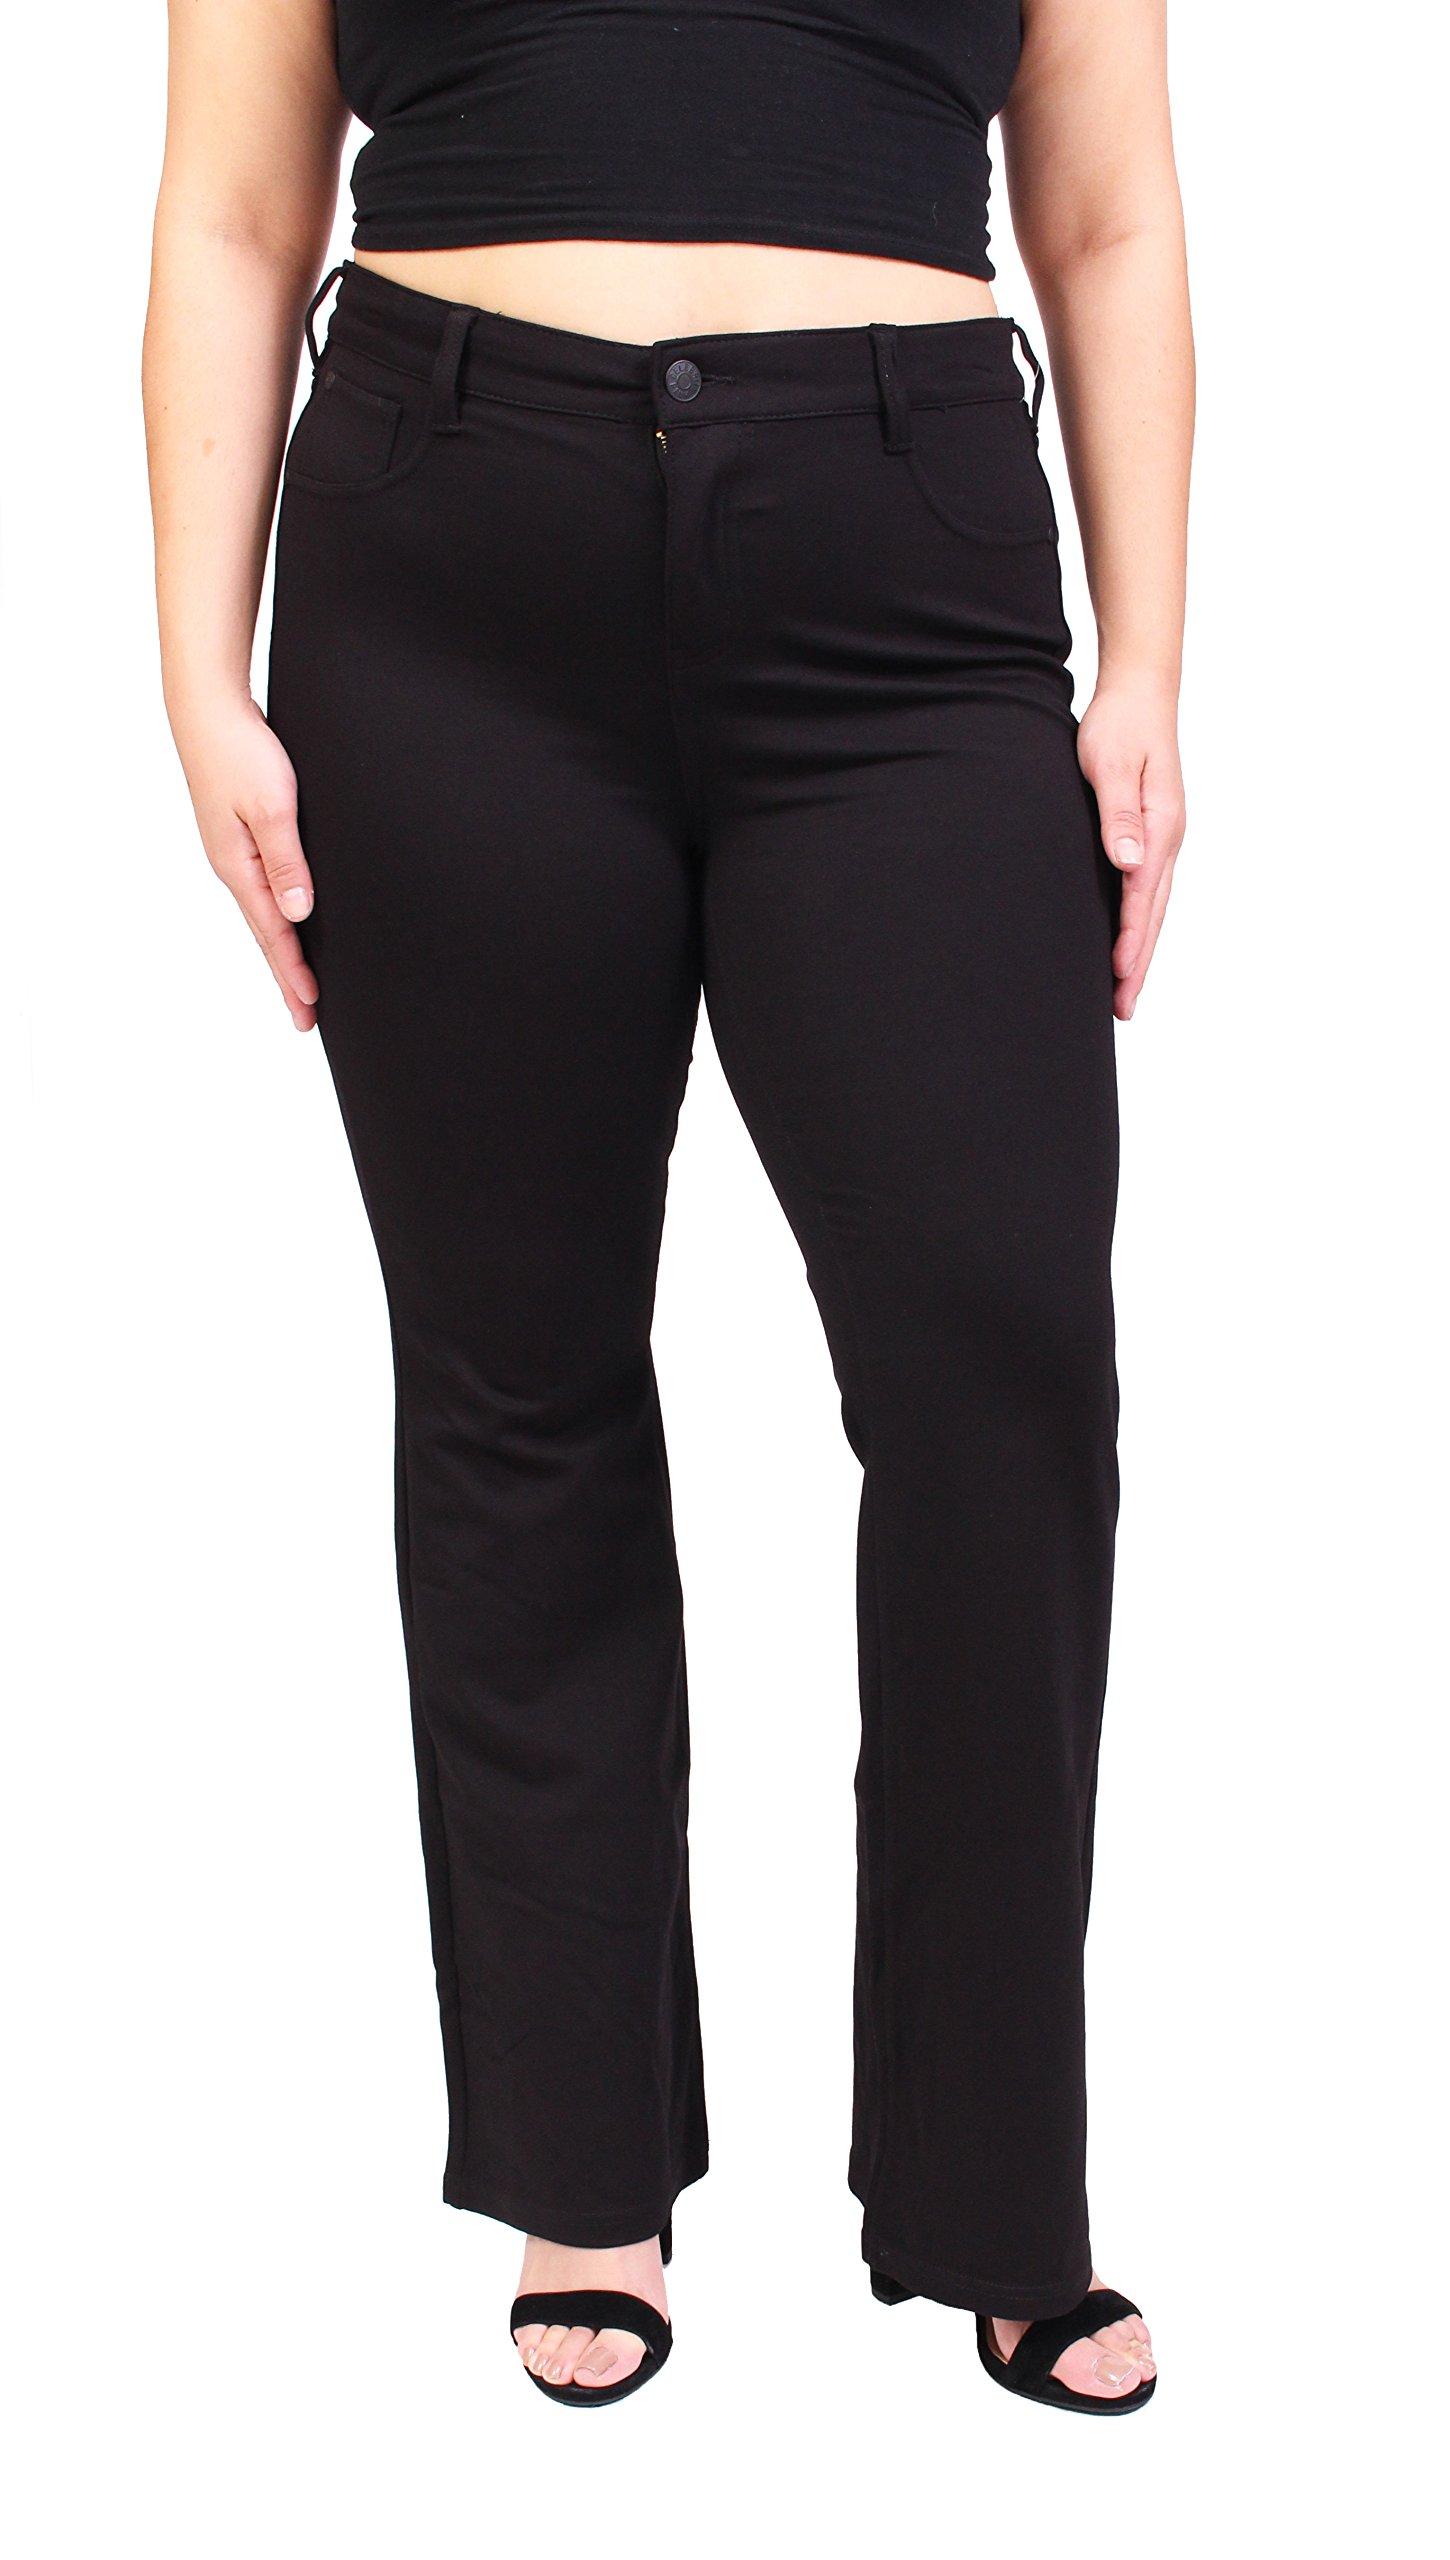 Celebrity Pink Women's Fashion Blue Jeans | Ponte Boot Cut| Plus Size | Button-Zipper Fly with 5 Pockets | Black Denim | Size 20